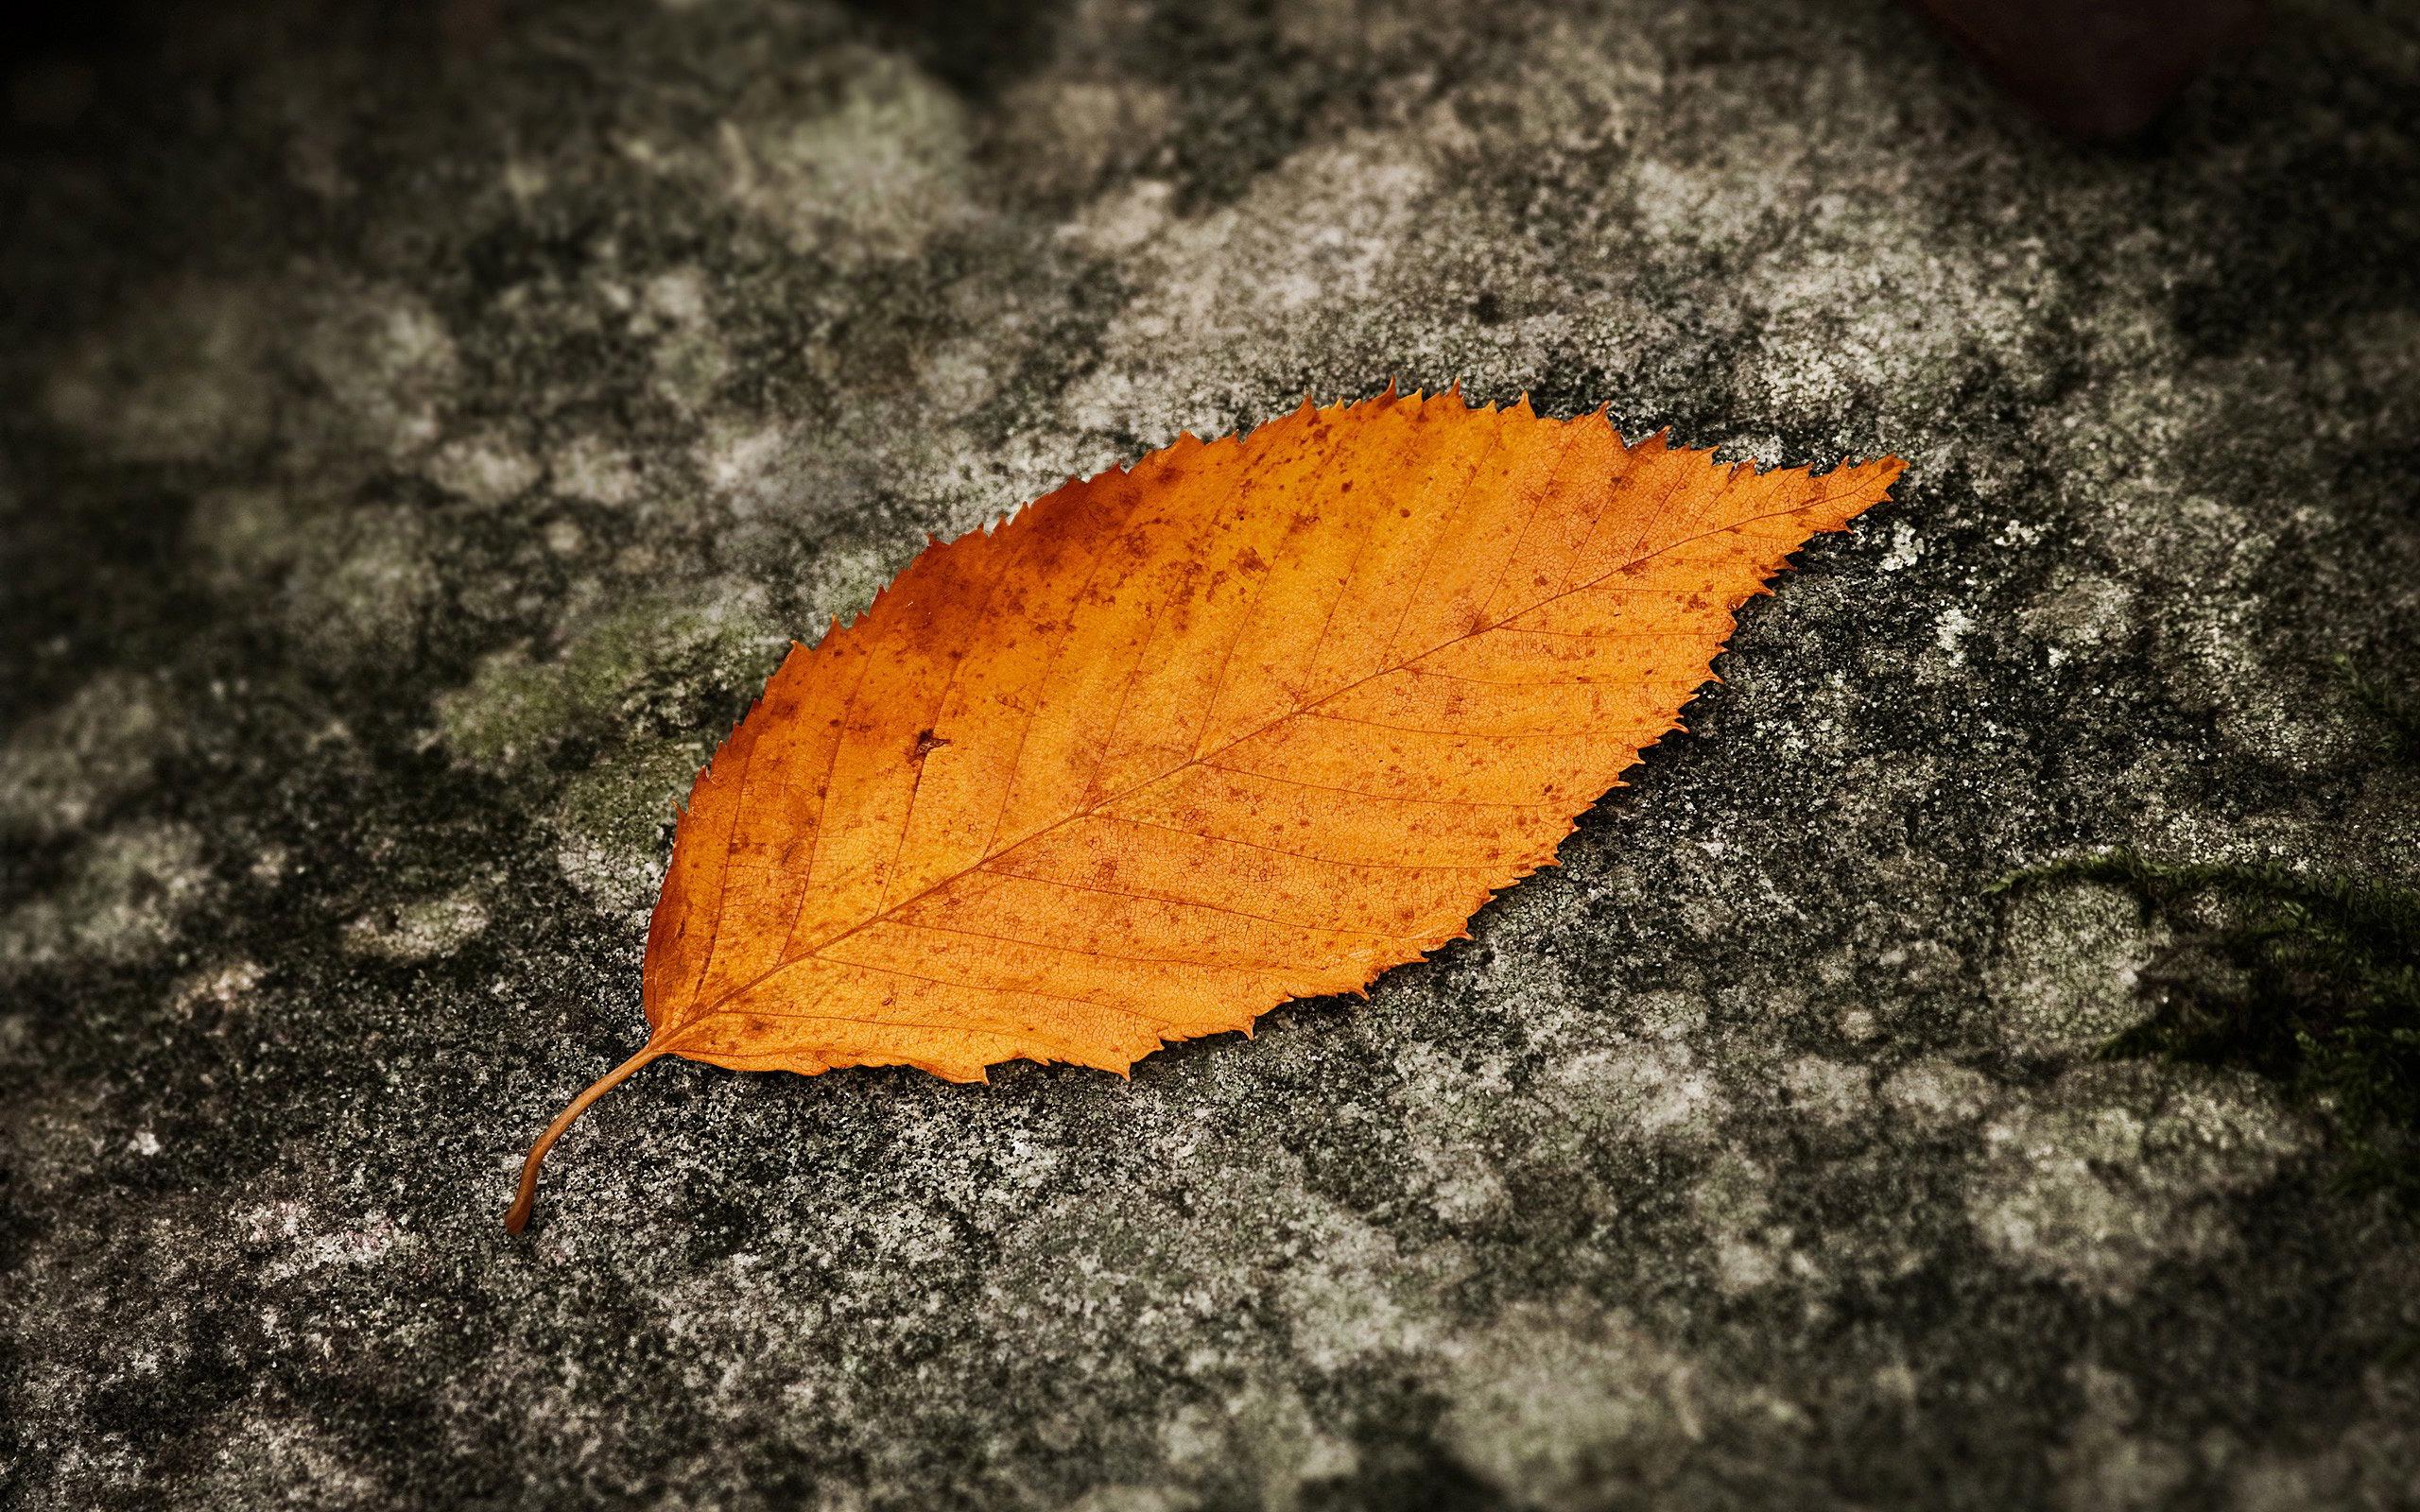 leaf on ground wallpaper - HD Desktop Wallpapers | 4k HD